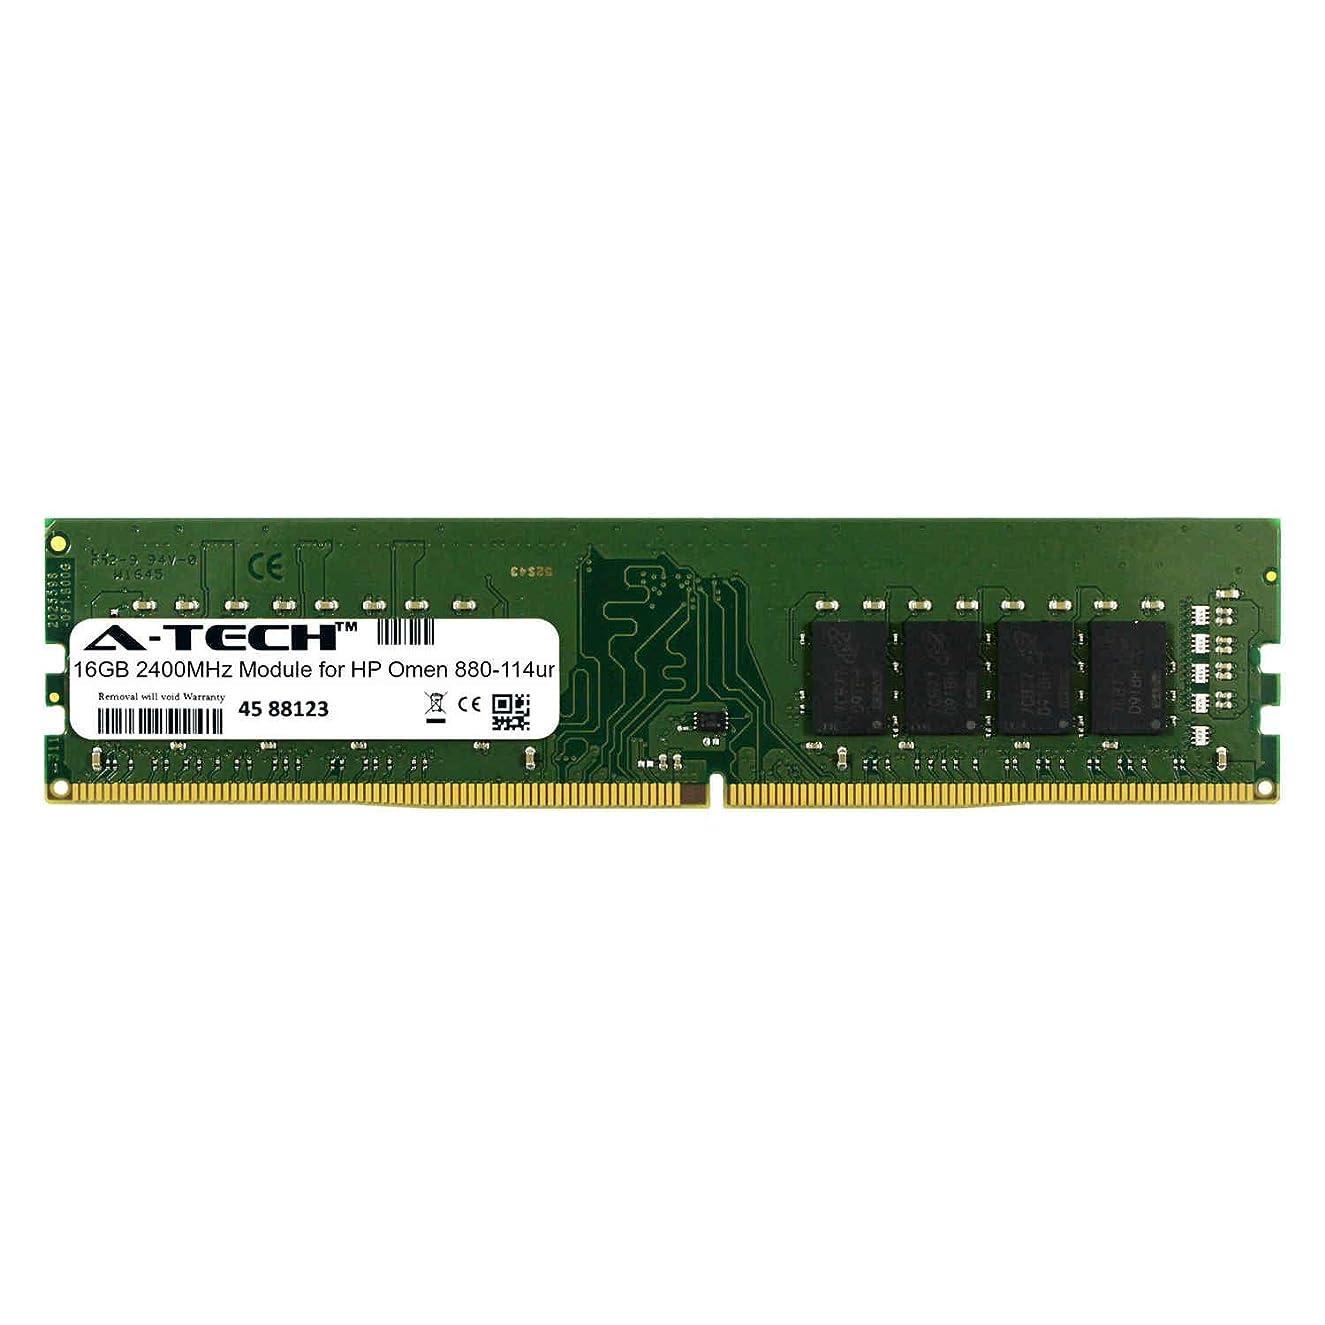 A-Tech 16GB Module for HP Omen 880-114ur Desktop & Workstation Motherboard Compatible DDR4 2400Mhz Memory Ram (ATMS282726A25822X1)